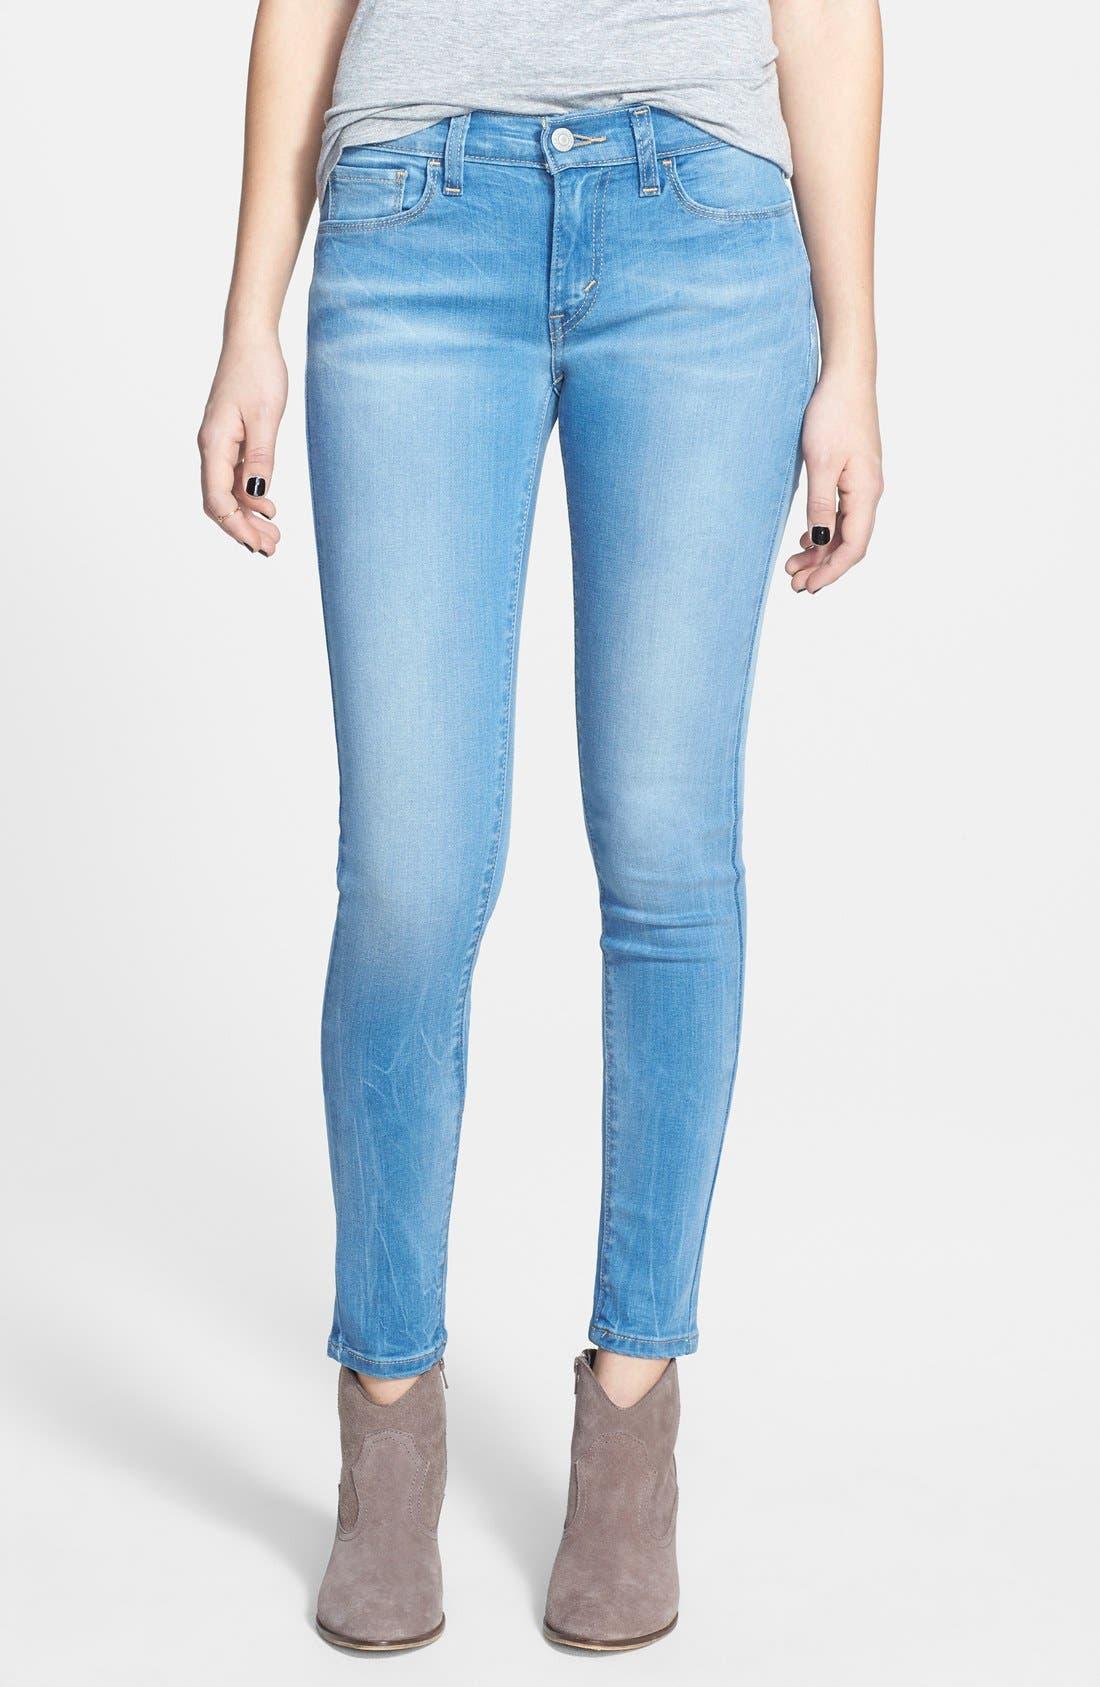 Alternate Image 1 Selected - Levi's® Super Skinny Jeans (Indigo)